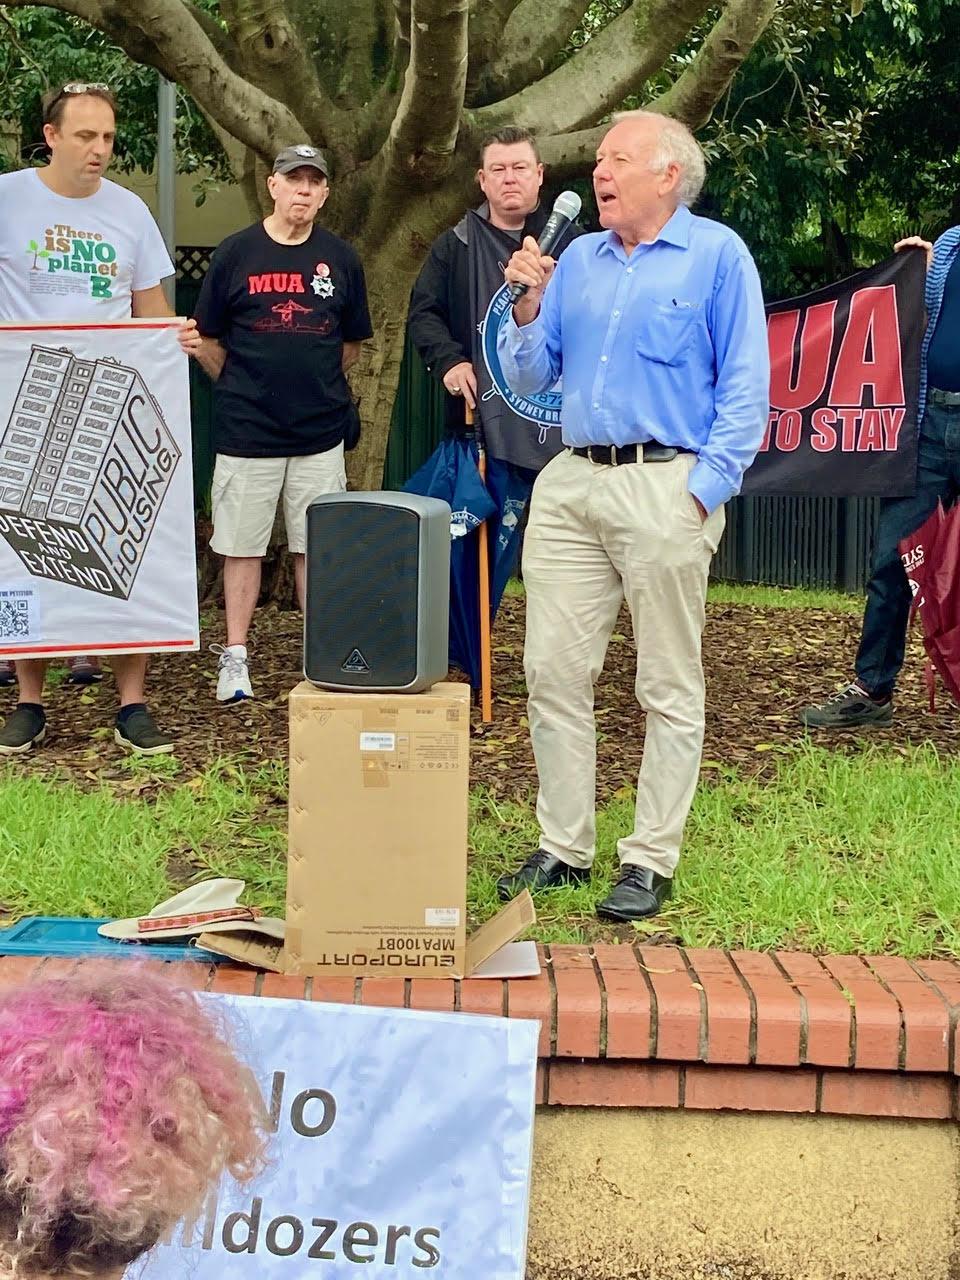 Ian Stephenson addressing Hands Off Glebe rally